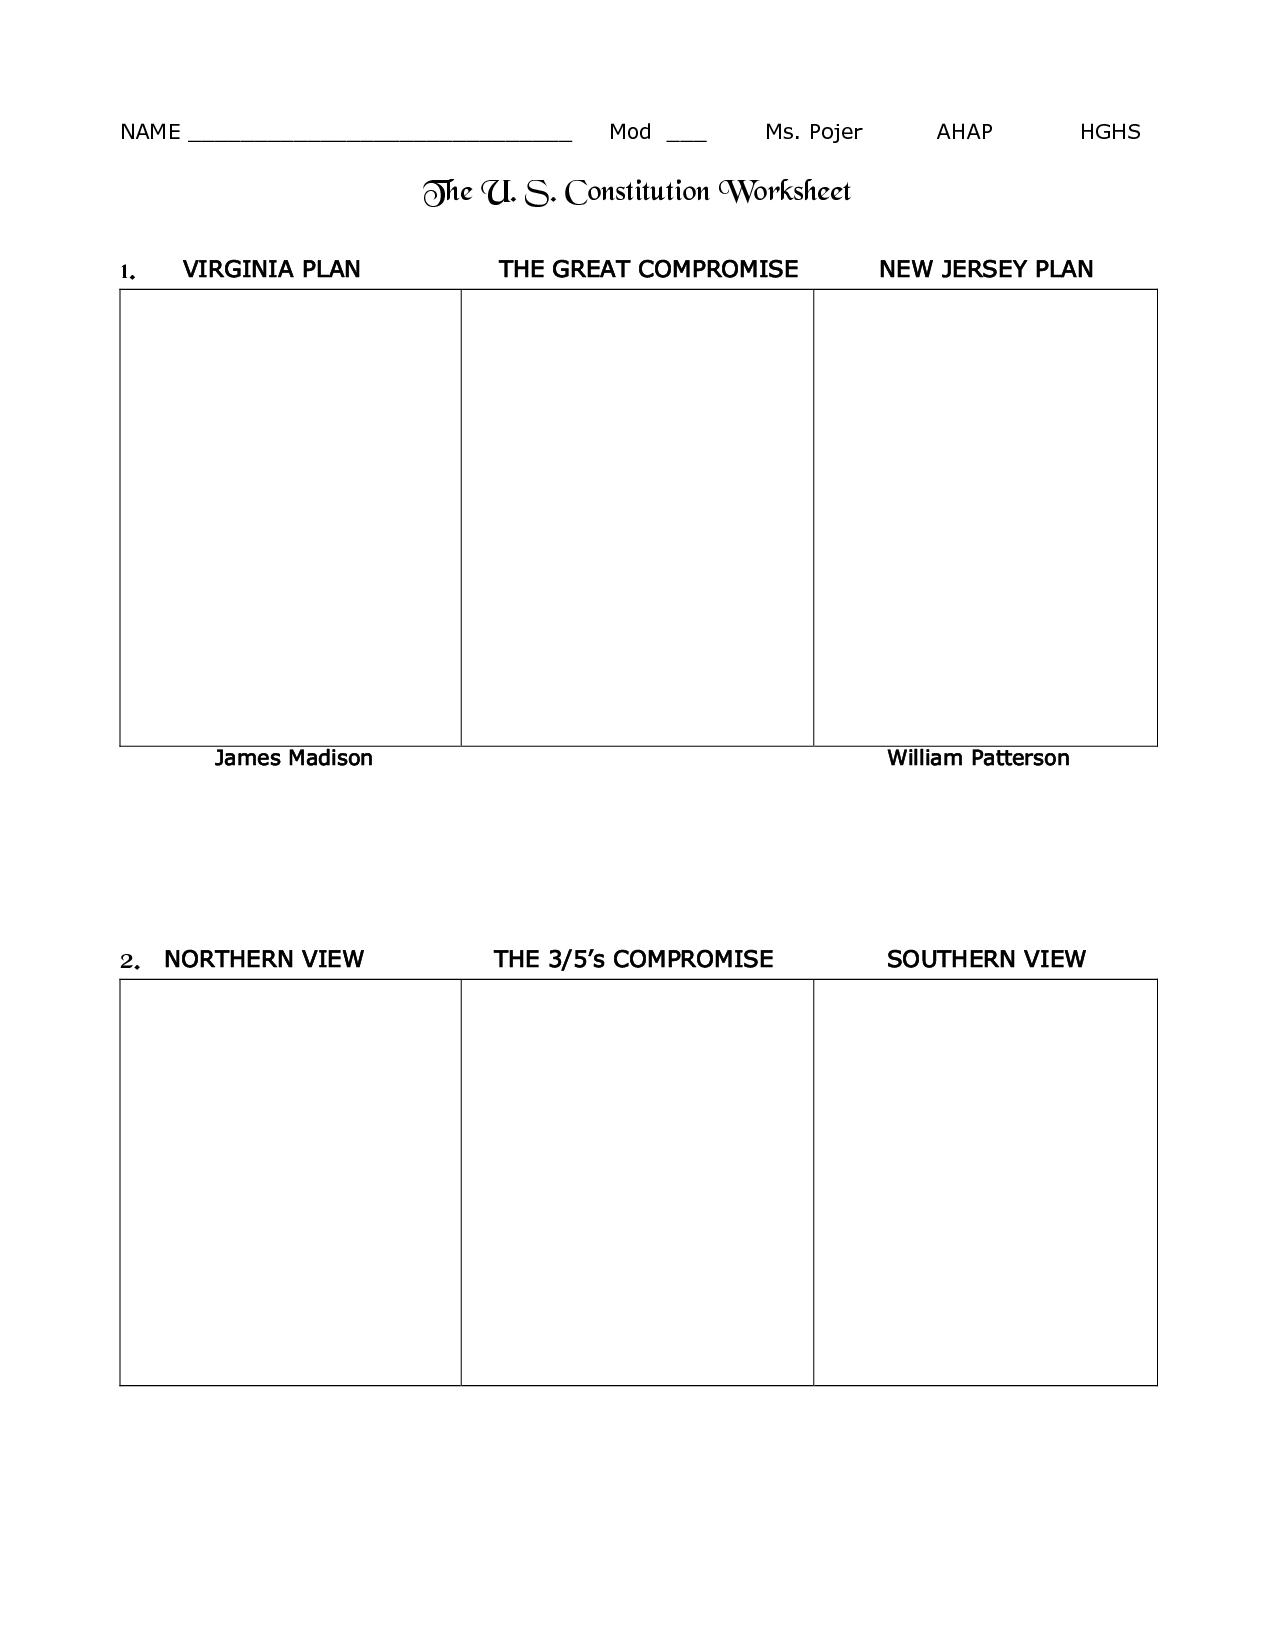 Worksheet The Us Constitution Worksheet Worksheet Fun